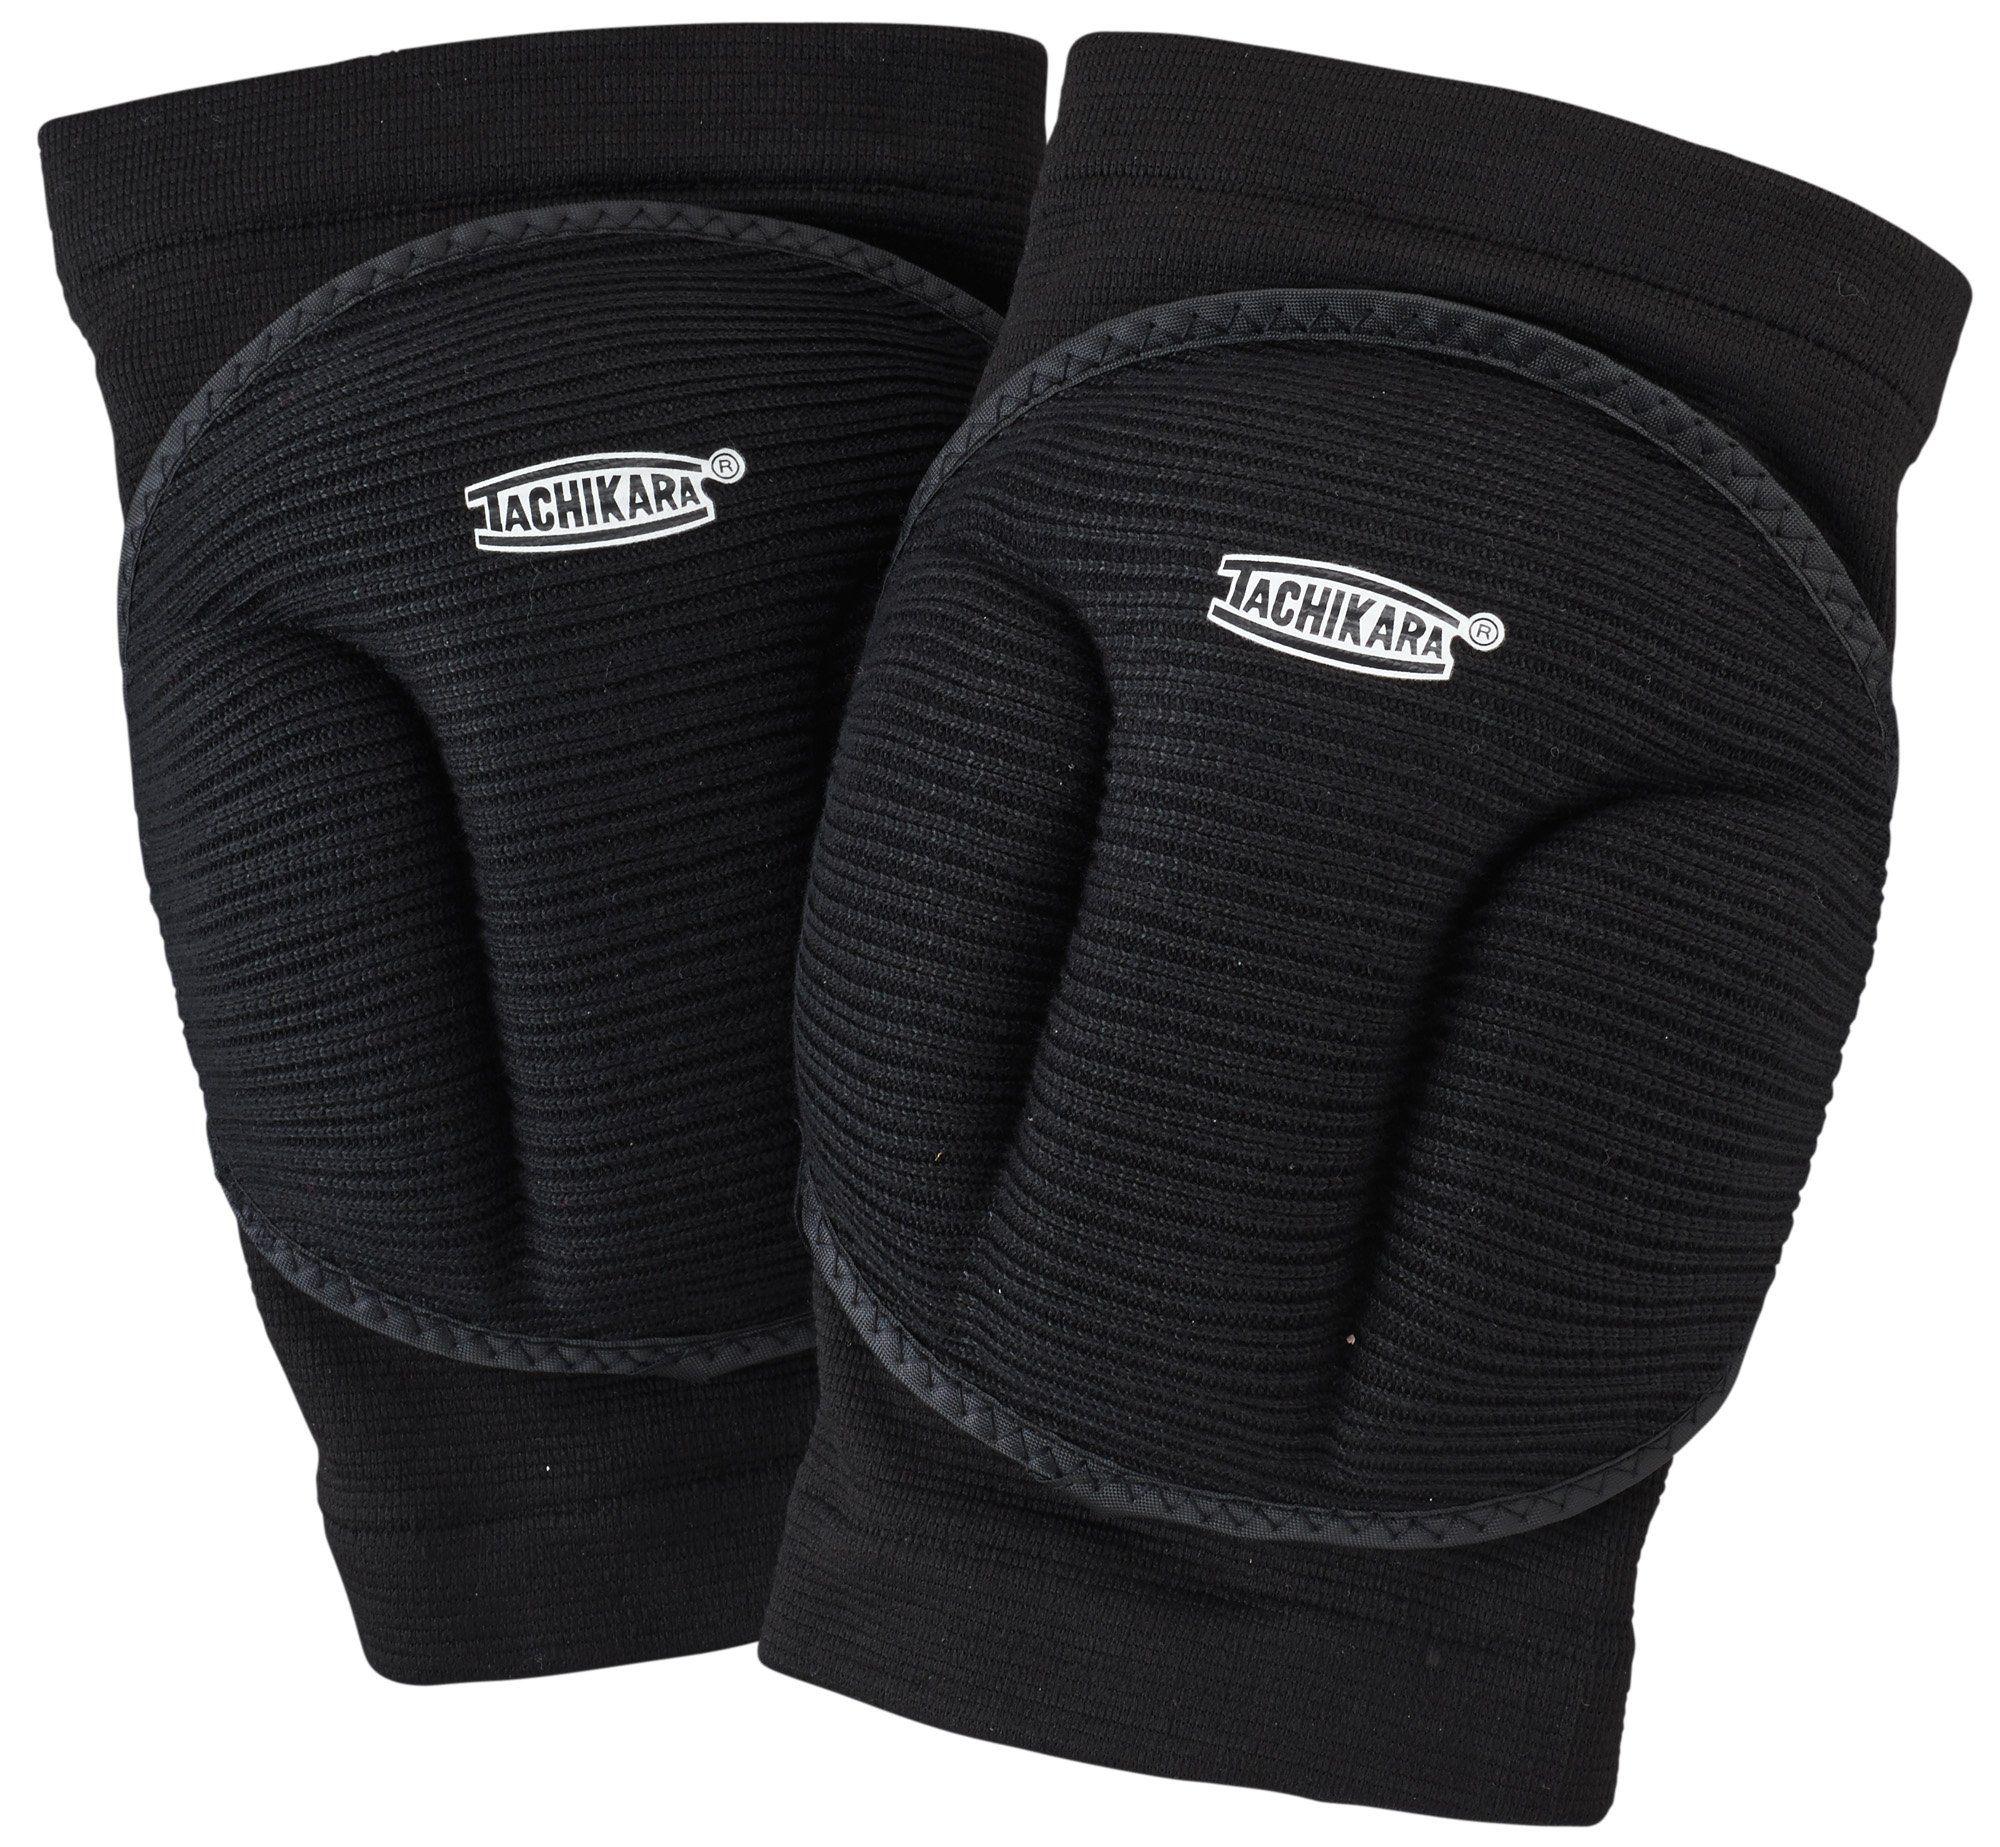 Tachikara Tkp Blk Bubble Knee Pad Black High Density Foam Inside A Solid Elastic Sleeve Allows Freed Volleyball Knee Pads Knee Pads Compression Leg Sleeves